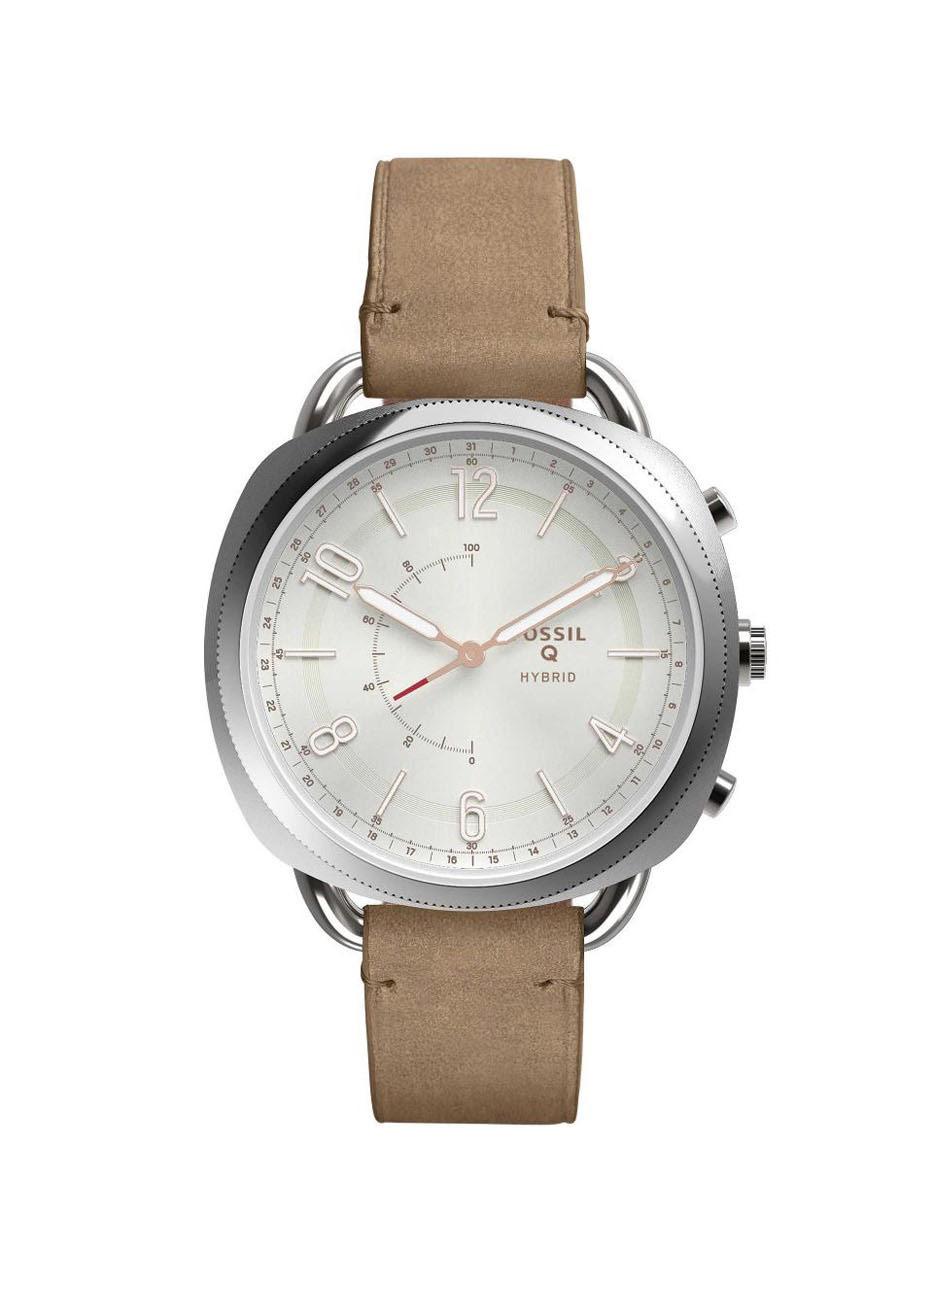 Fossil Q Accomplice Hybrid Watch FTW1200